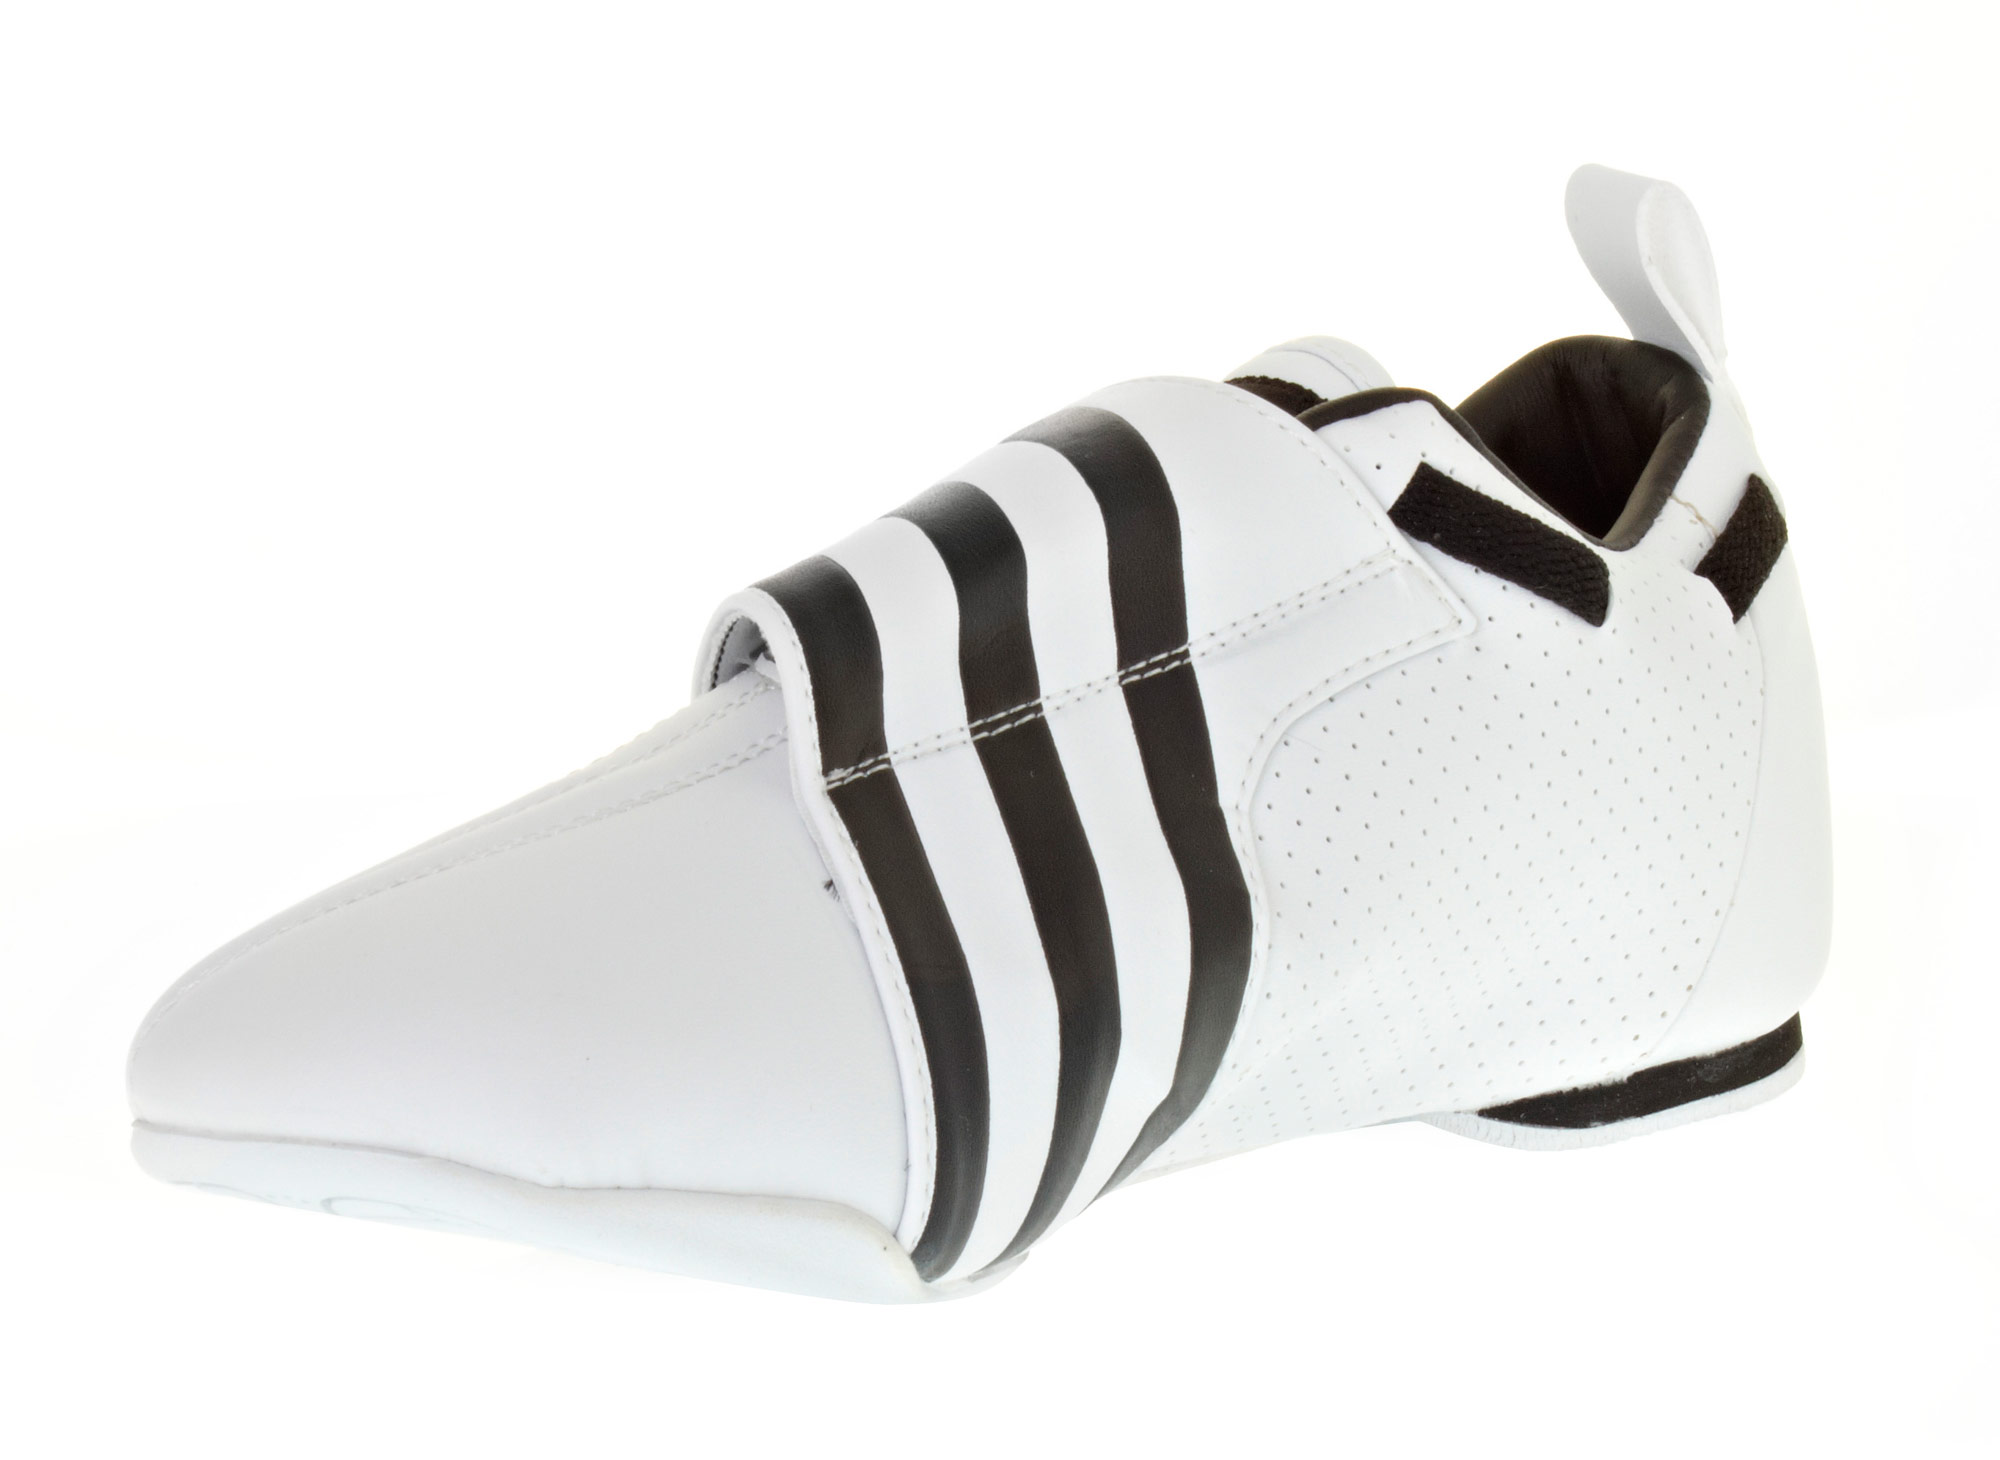 Adidas Mattenschuh Adilux weißschwarz Ju Jutsu Shop